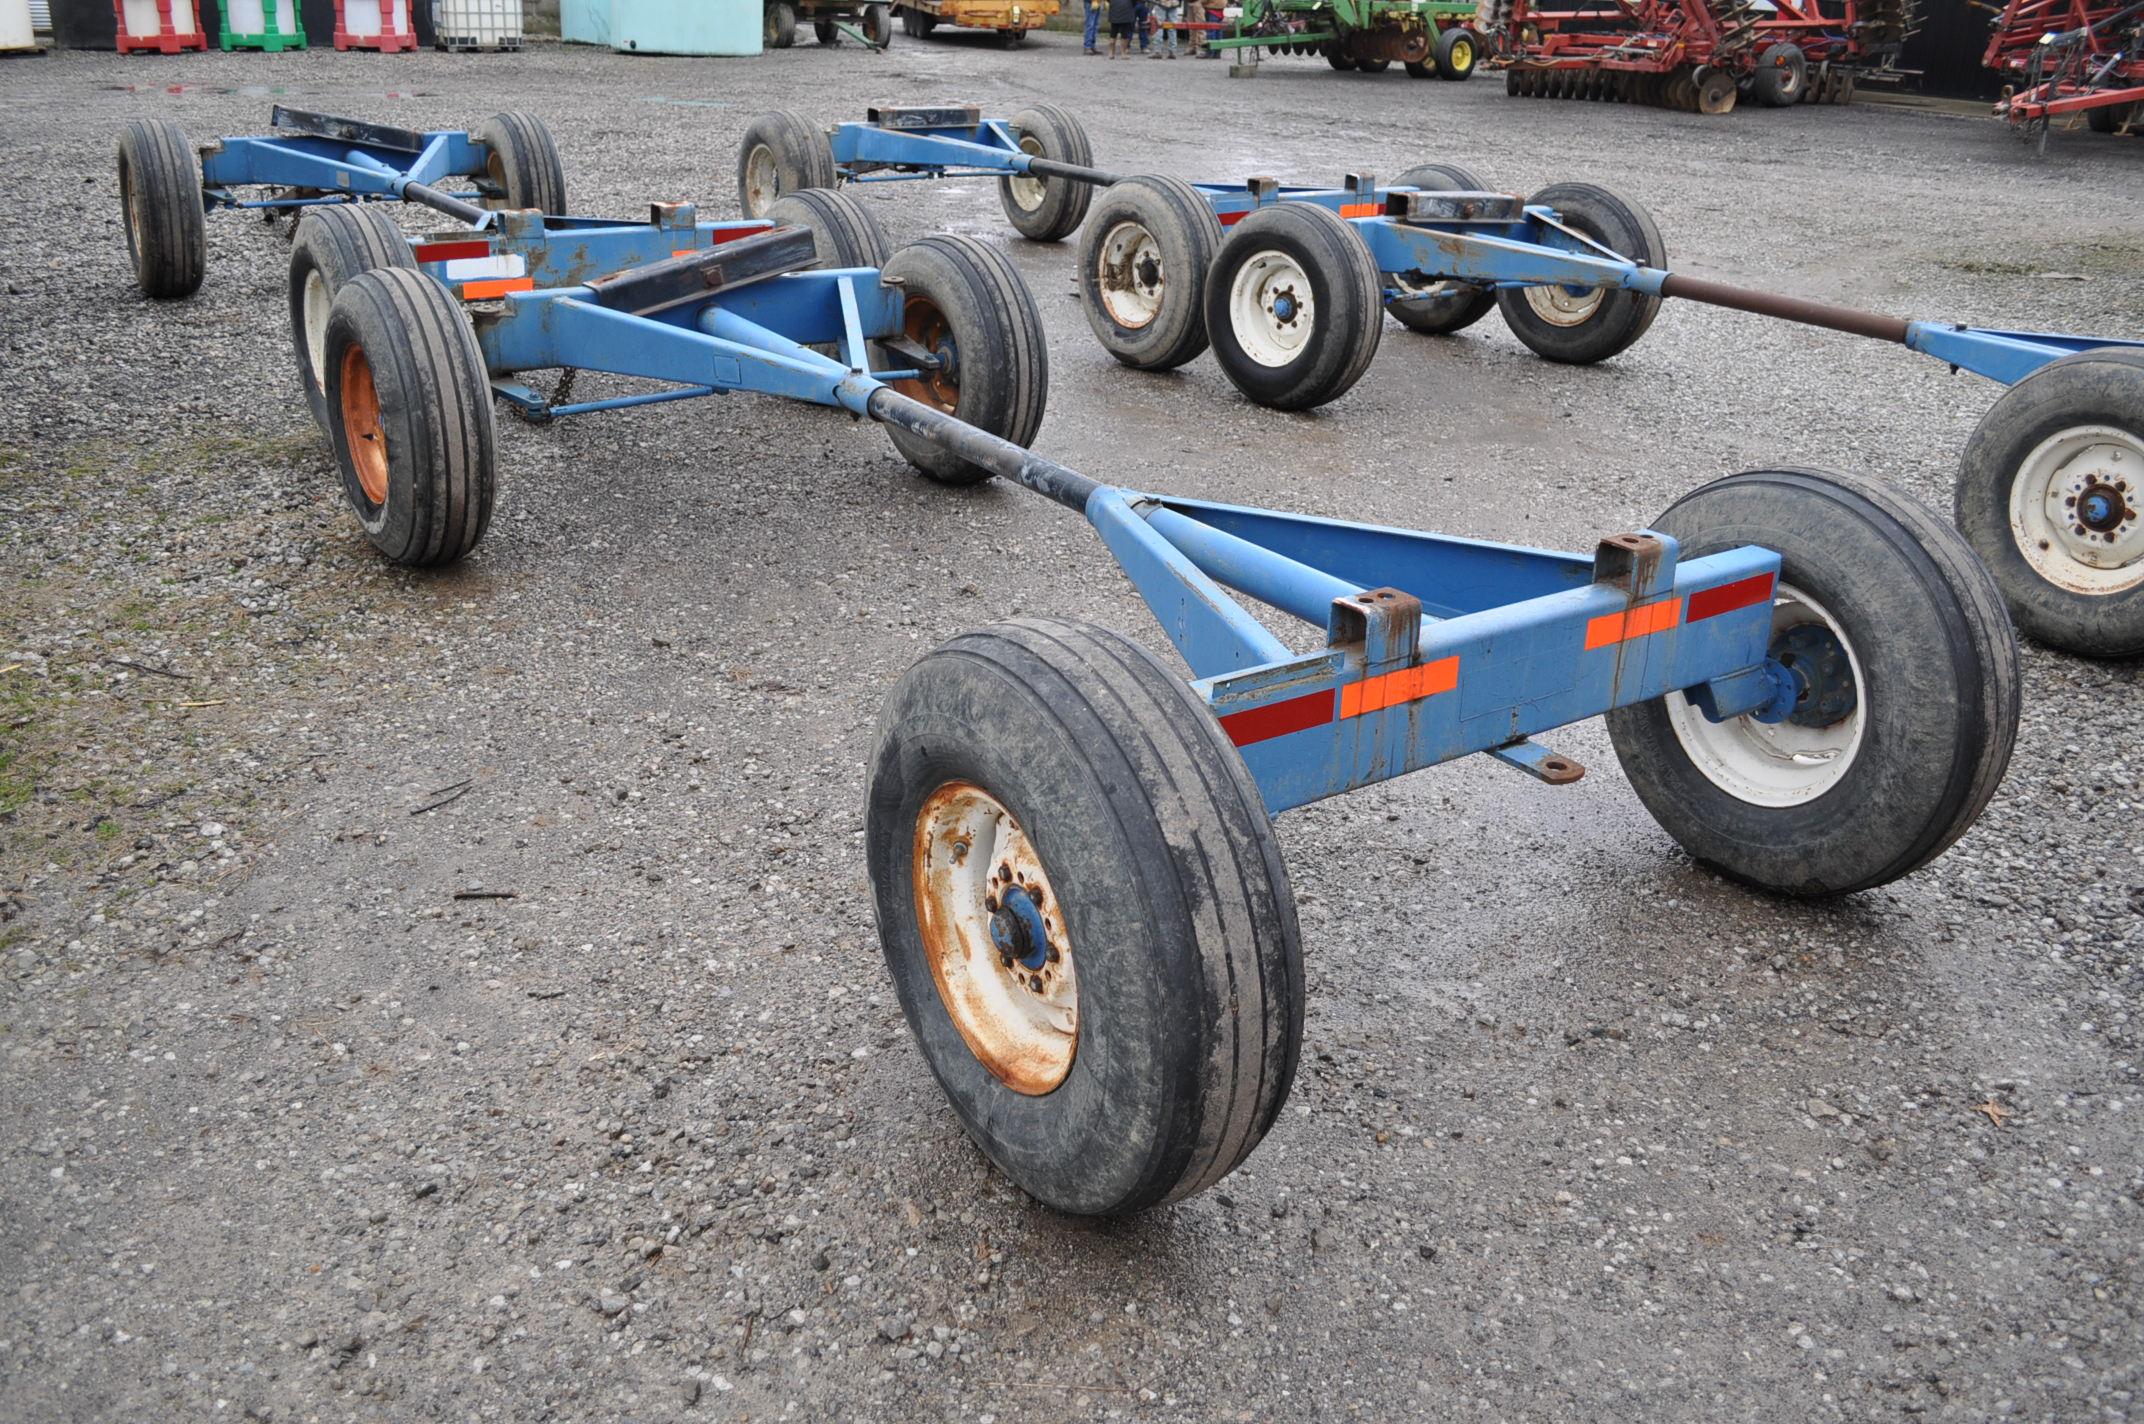 NH3 wagon gear - Image 3 of 8